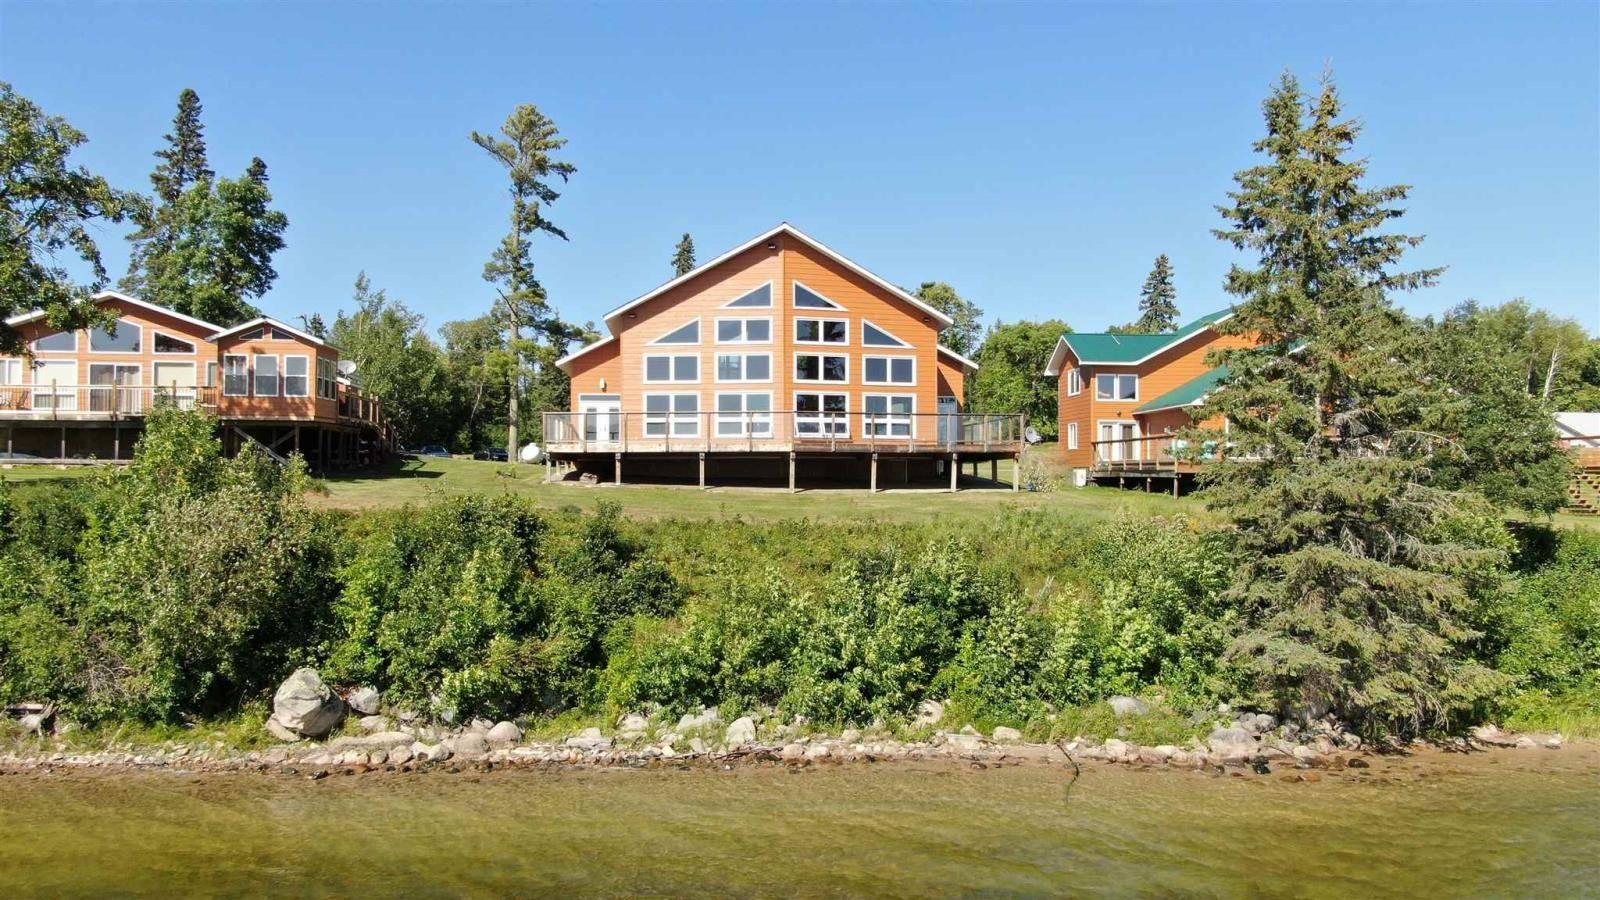 House for sale at 141 Shingwak Rd Unit 4 Sioux Narrows Ontario - MLS: TB200640